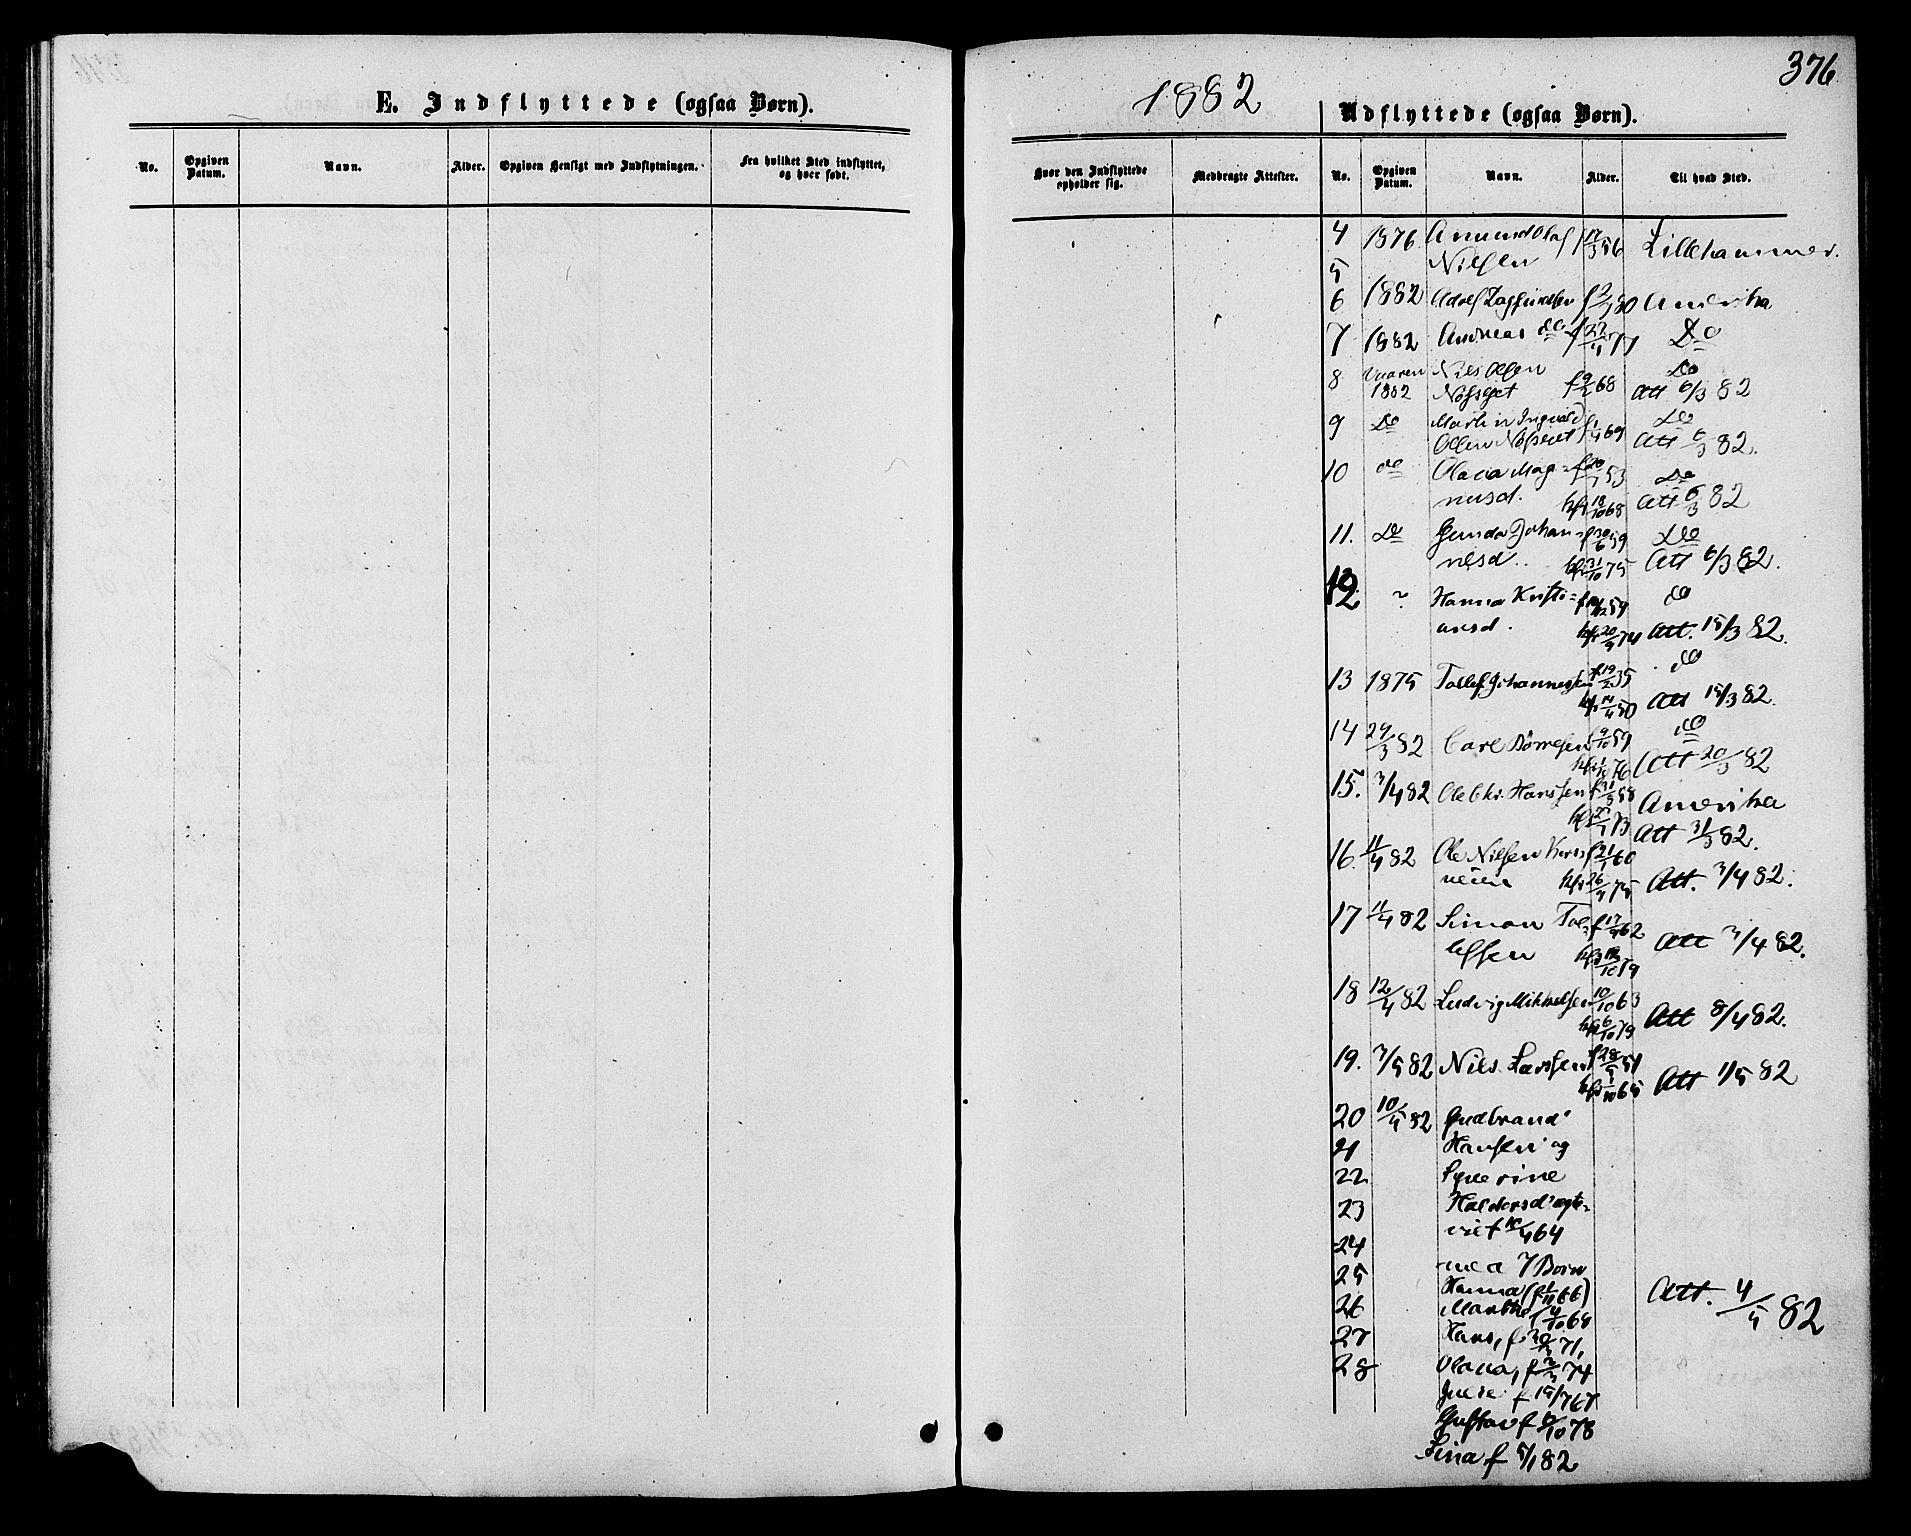 SAH, Biri prestekontor, Ministerialbok nr. 6, 1877-1886, s. 376